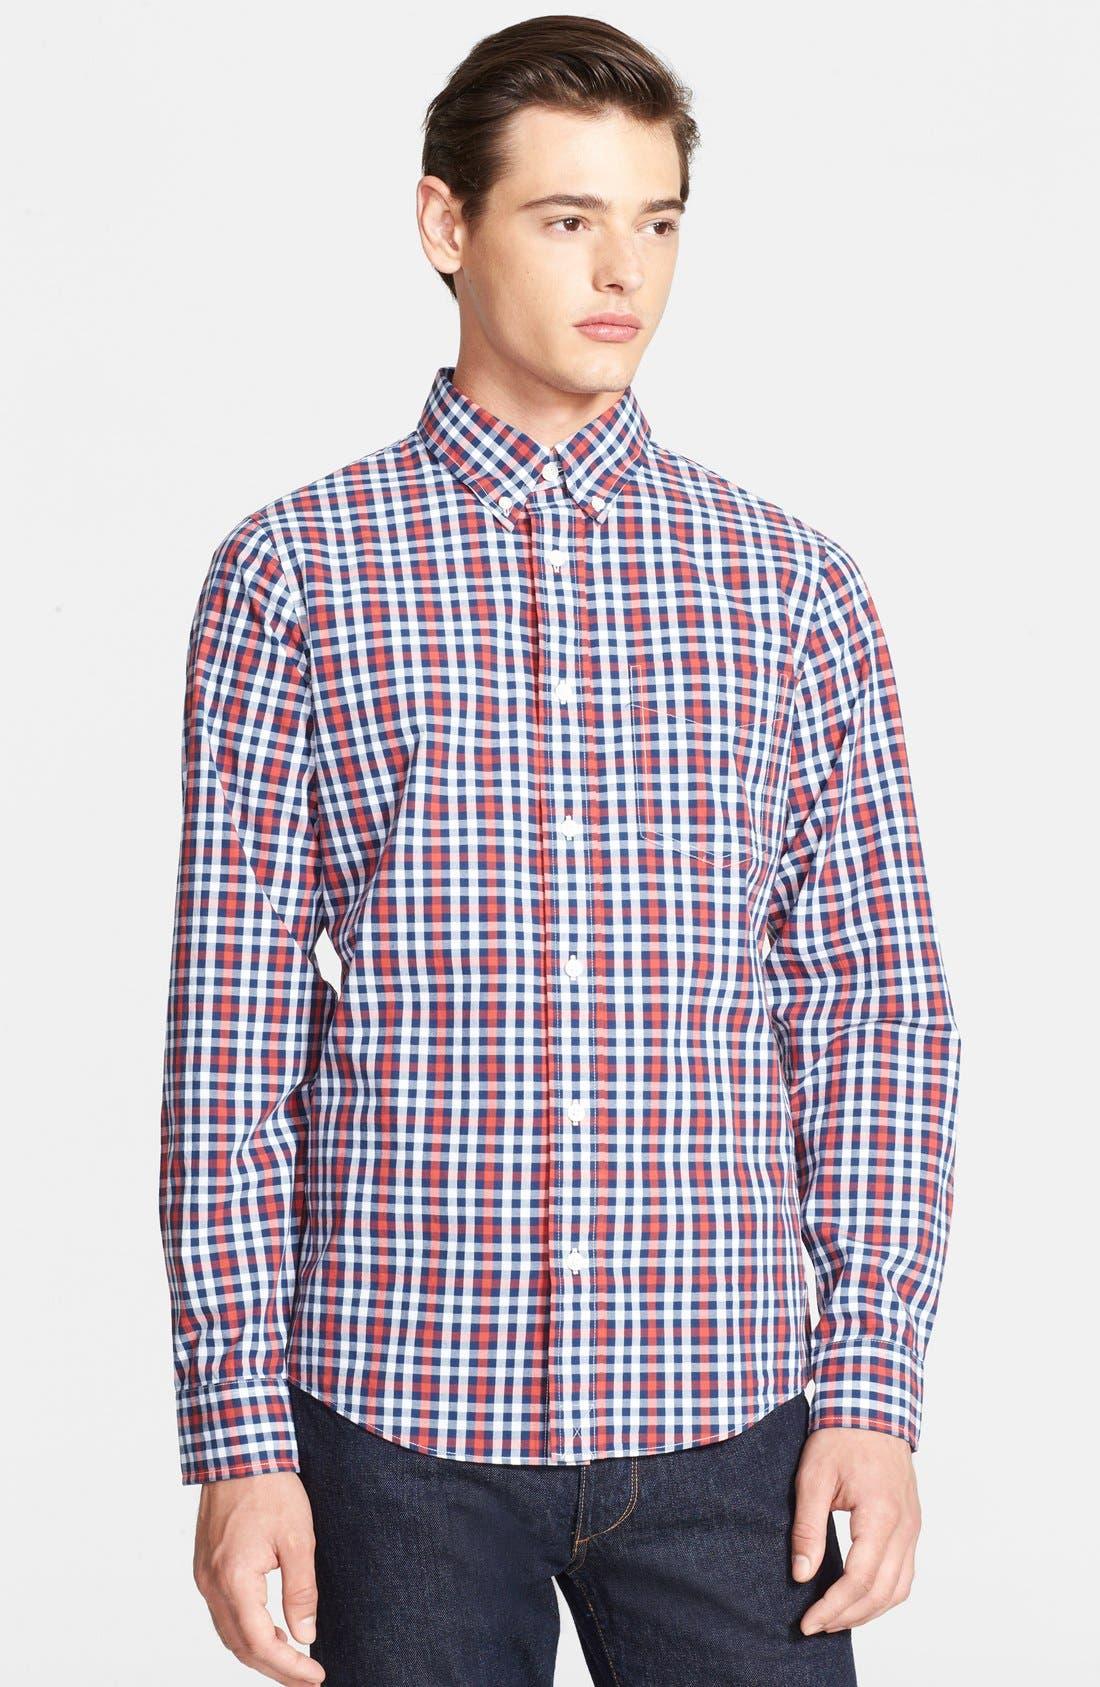 Alternate Image 1 Selected - Jack Spade 'Callahan' Check Woven Shirt